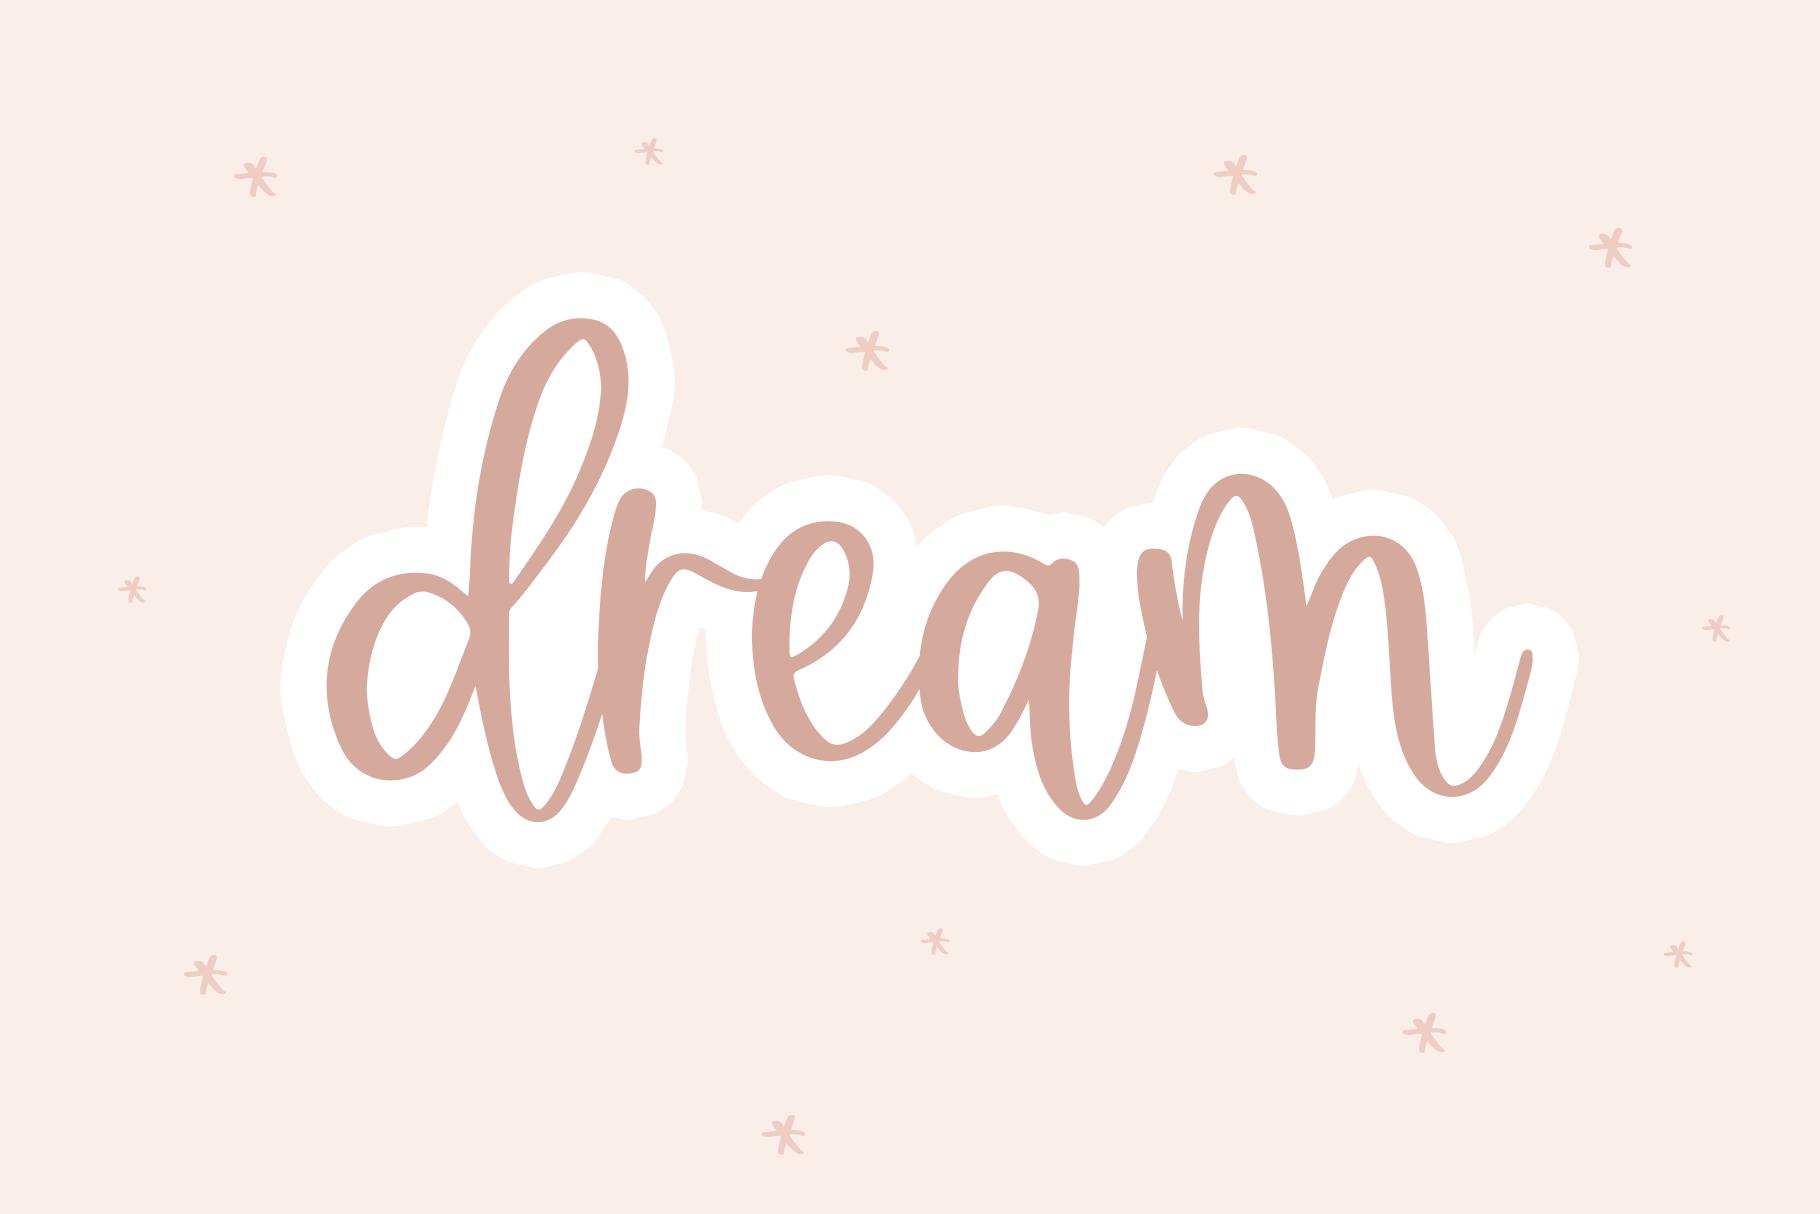 Brightside - A Bouncy Handwritten Script Font example image 8